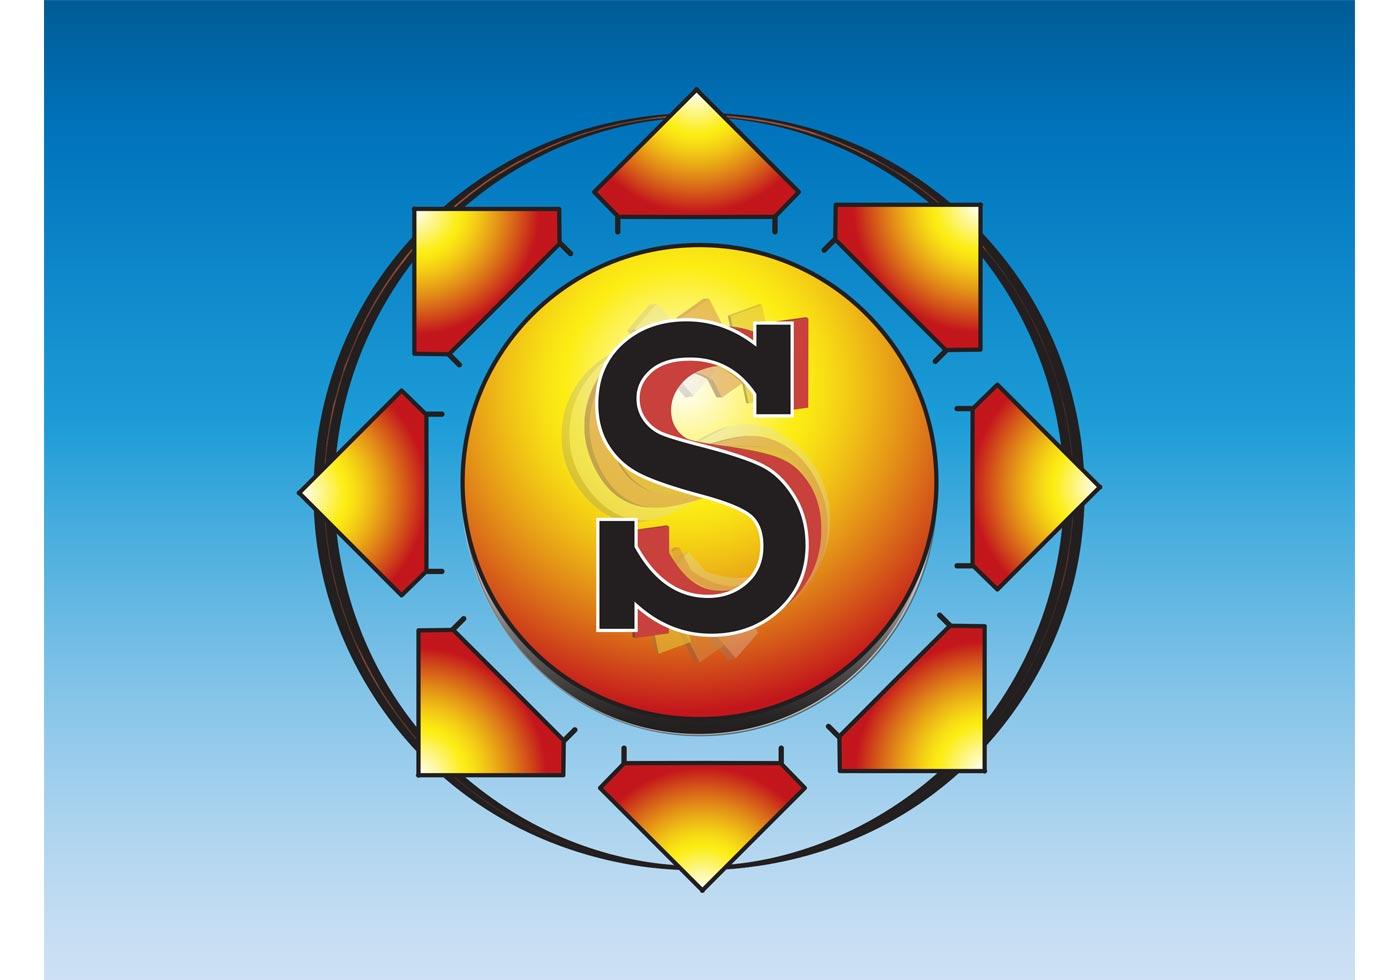 sun logo download free vector art stock graphics amp images